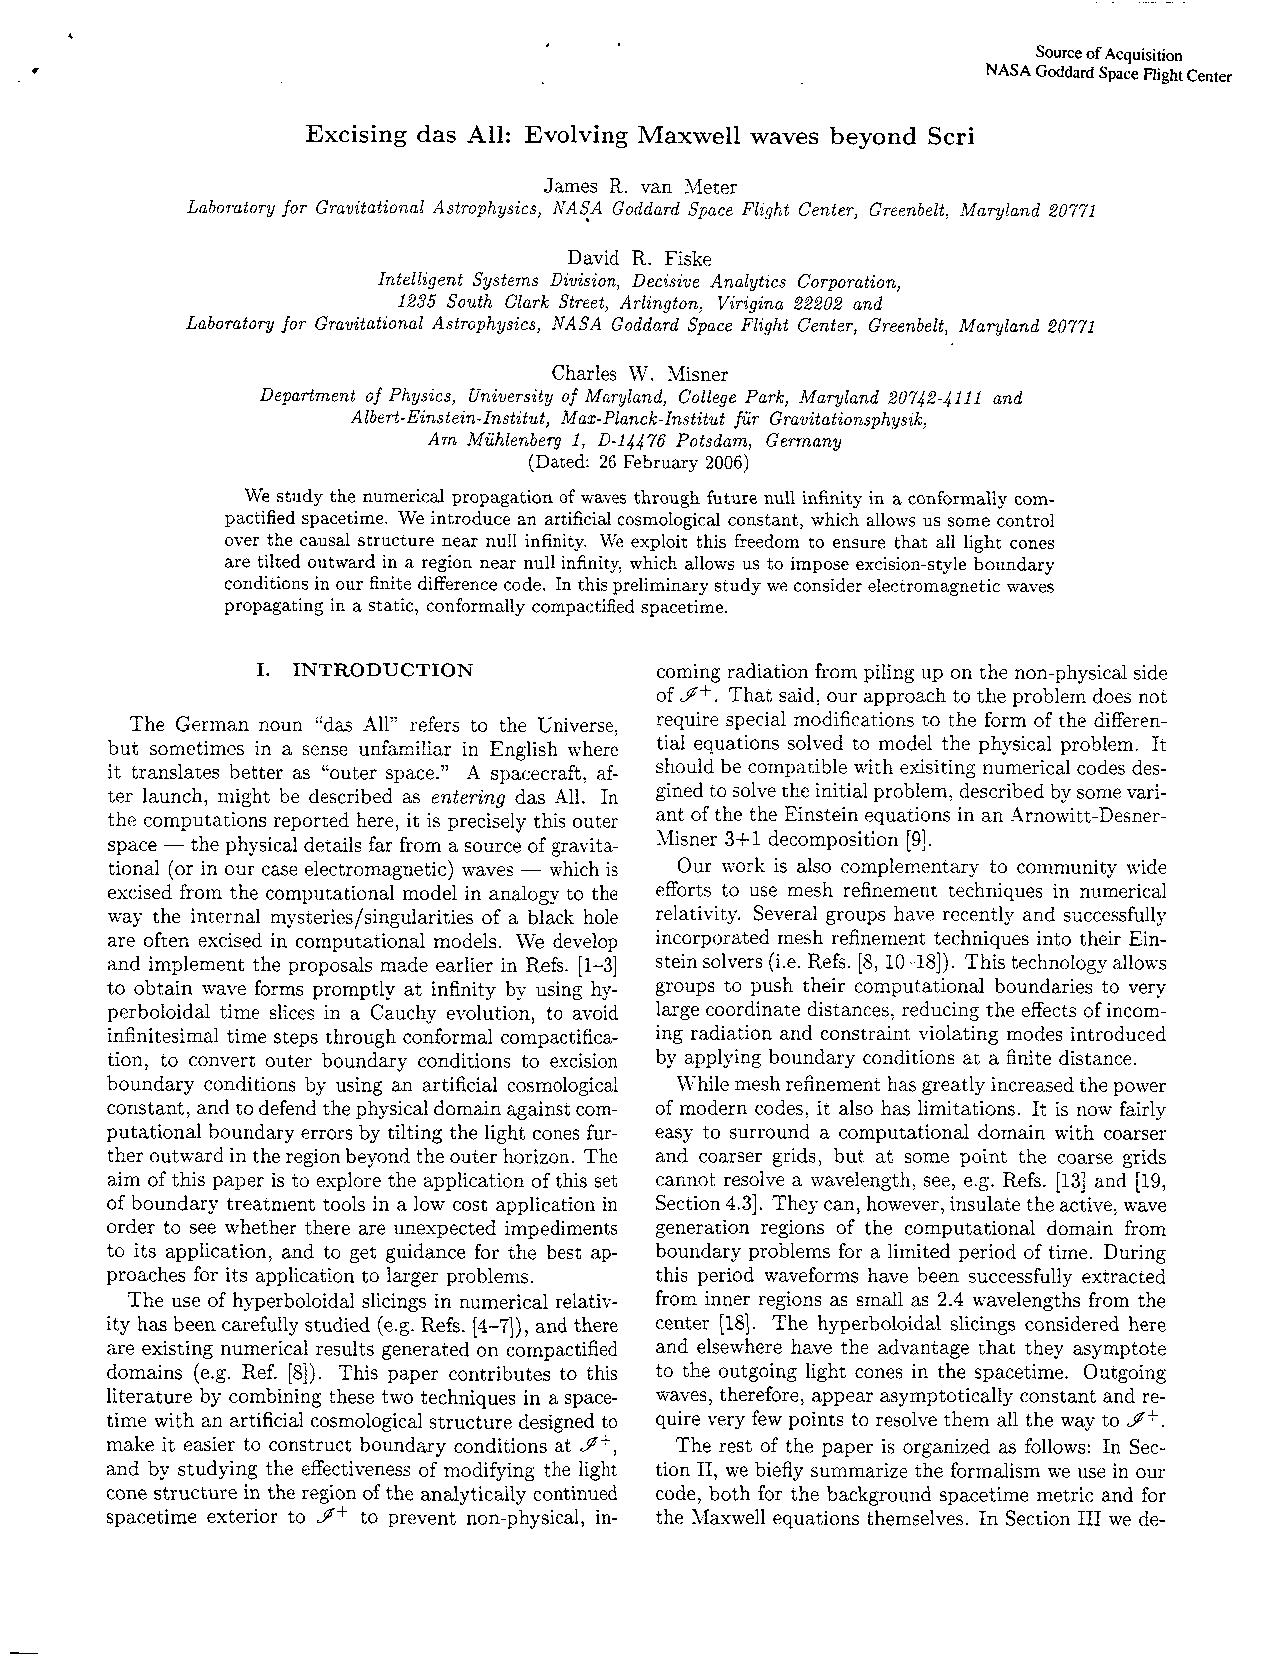 James R. vanMeter - Excising das All: Evolving Maxwell waves beyond Scri